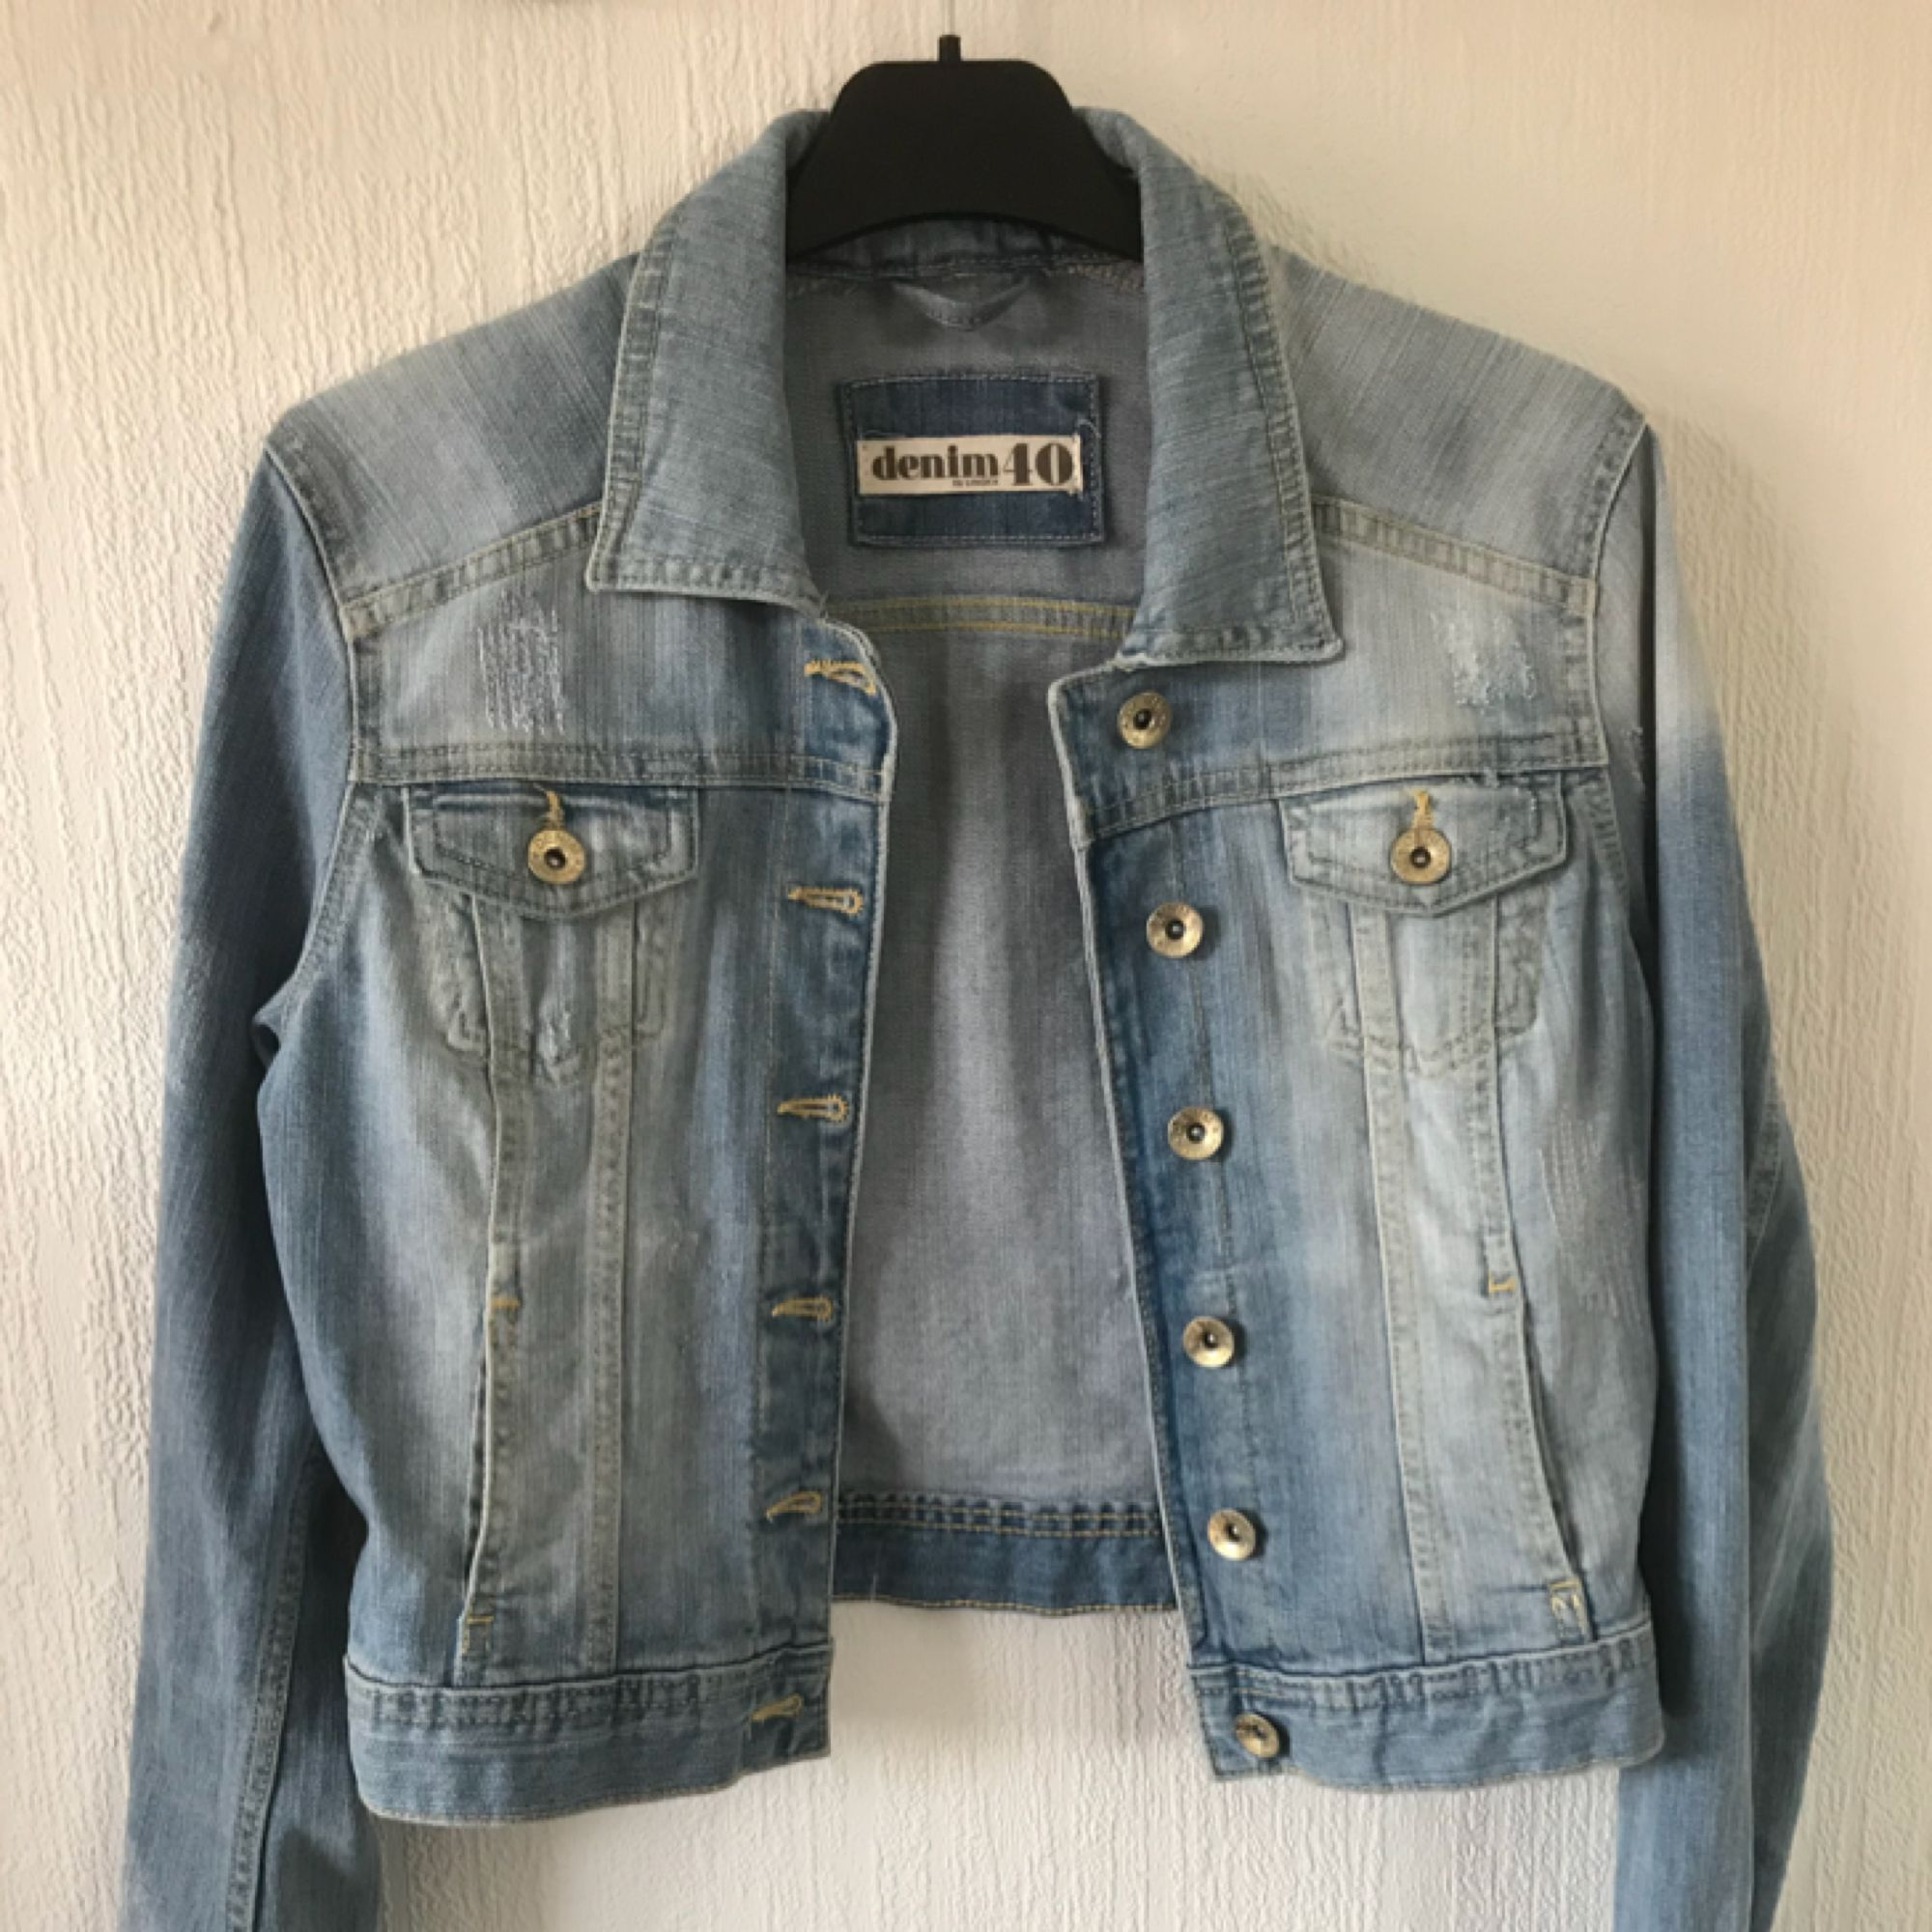 Midjekort jeans jacka! Storlek 40 men liten i storleken! Frakt tillkommer. Jackor.